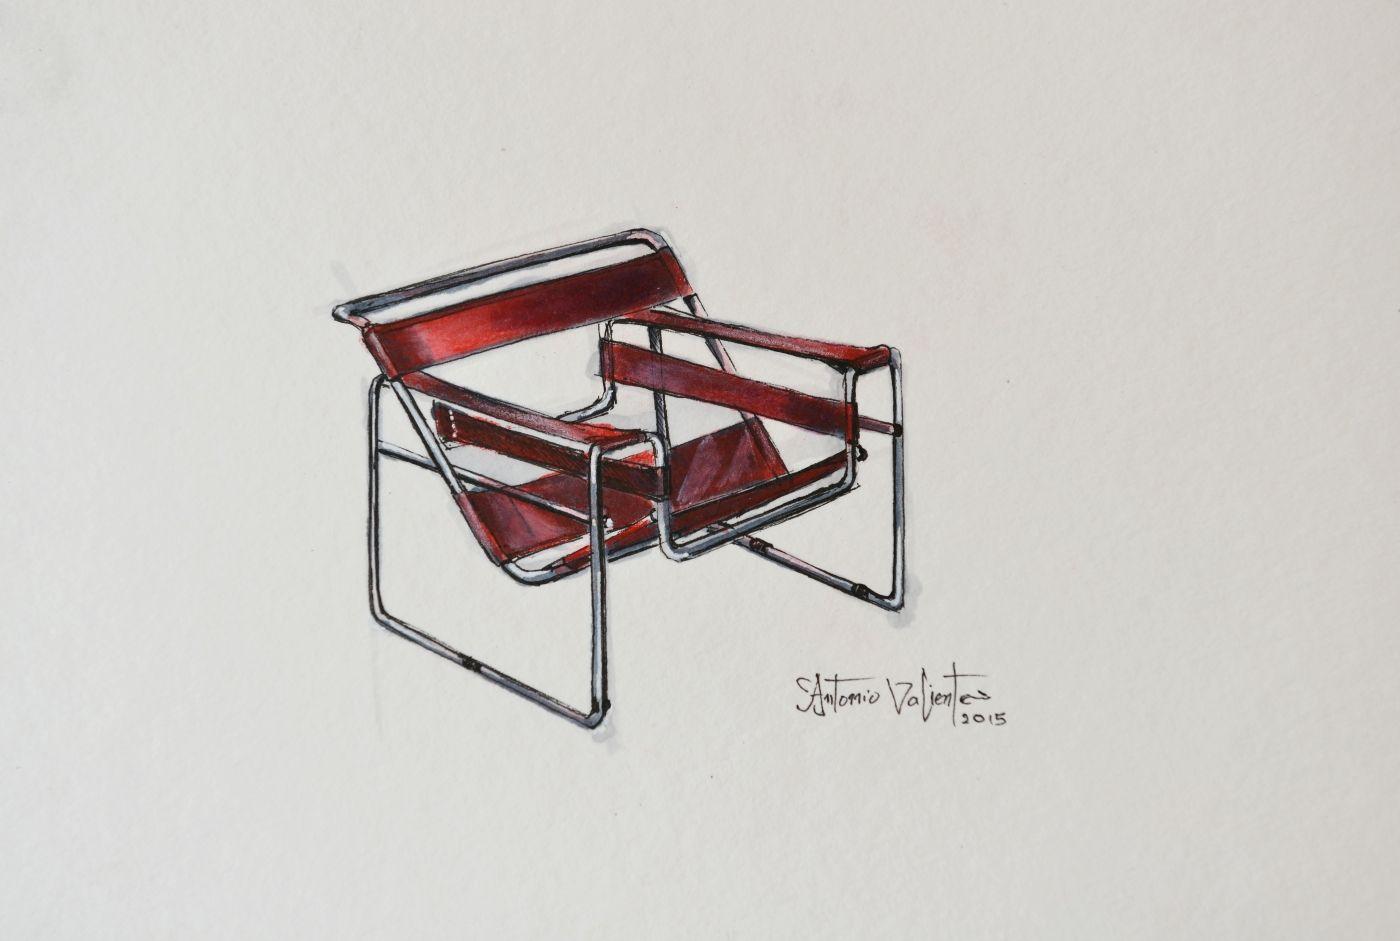 M s de 25 ideas incre bles sobre silla wassily en for Muebles de oficina wikipedia